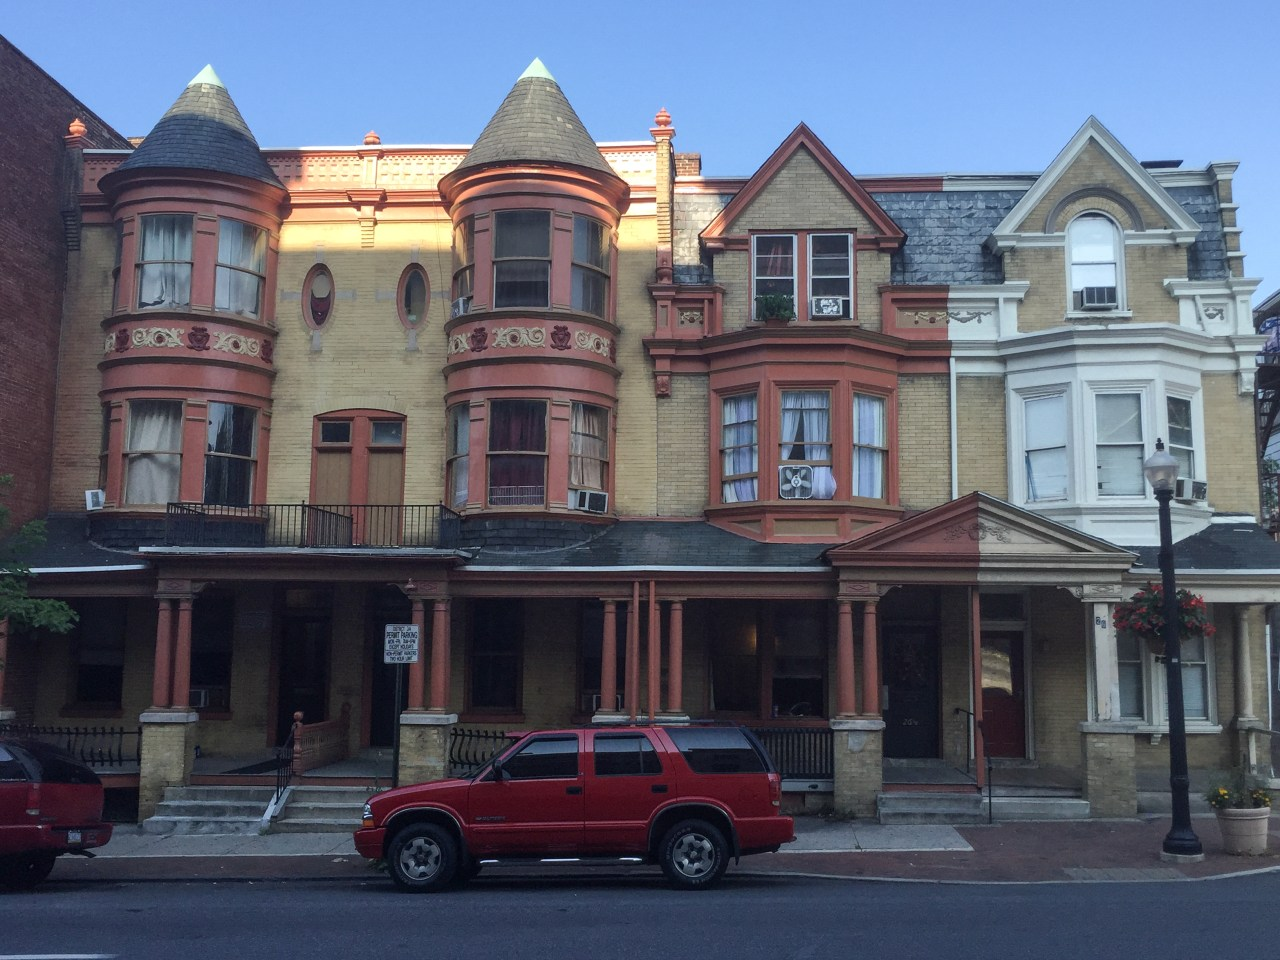 Row houses - Lancaster, PA